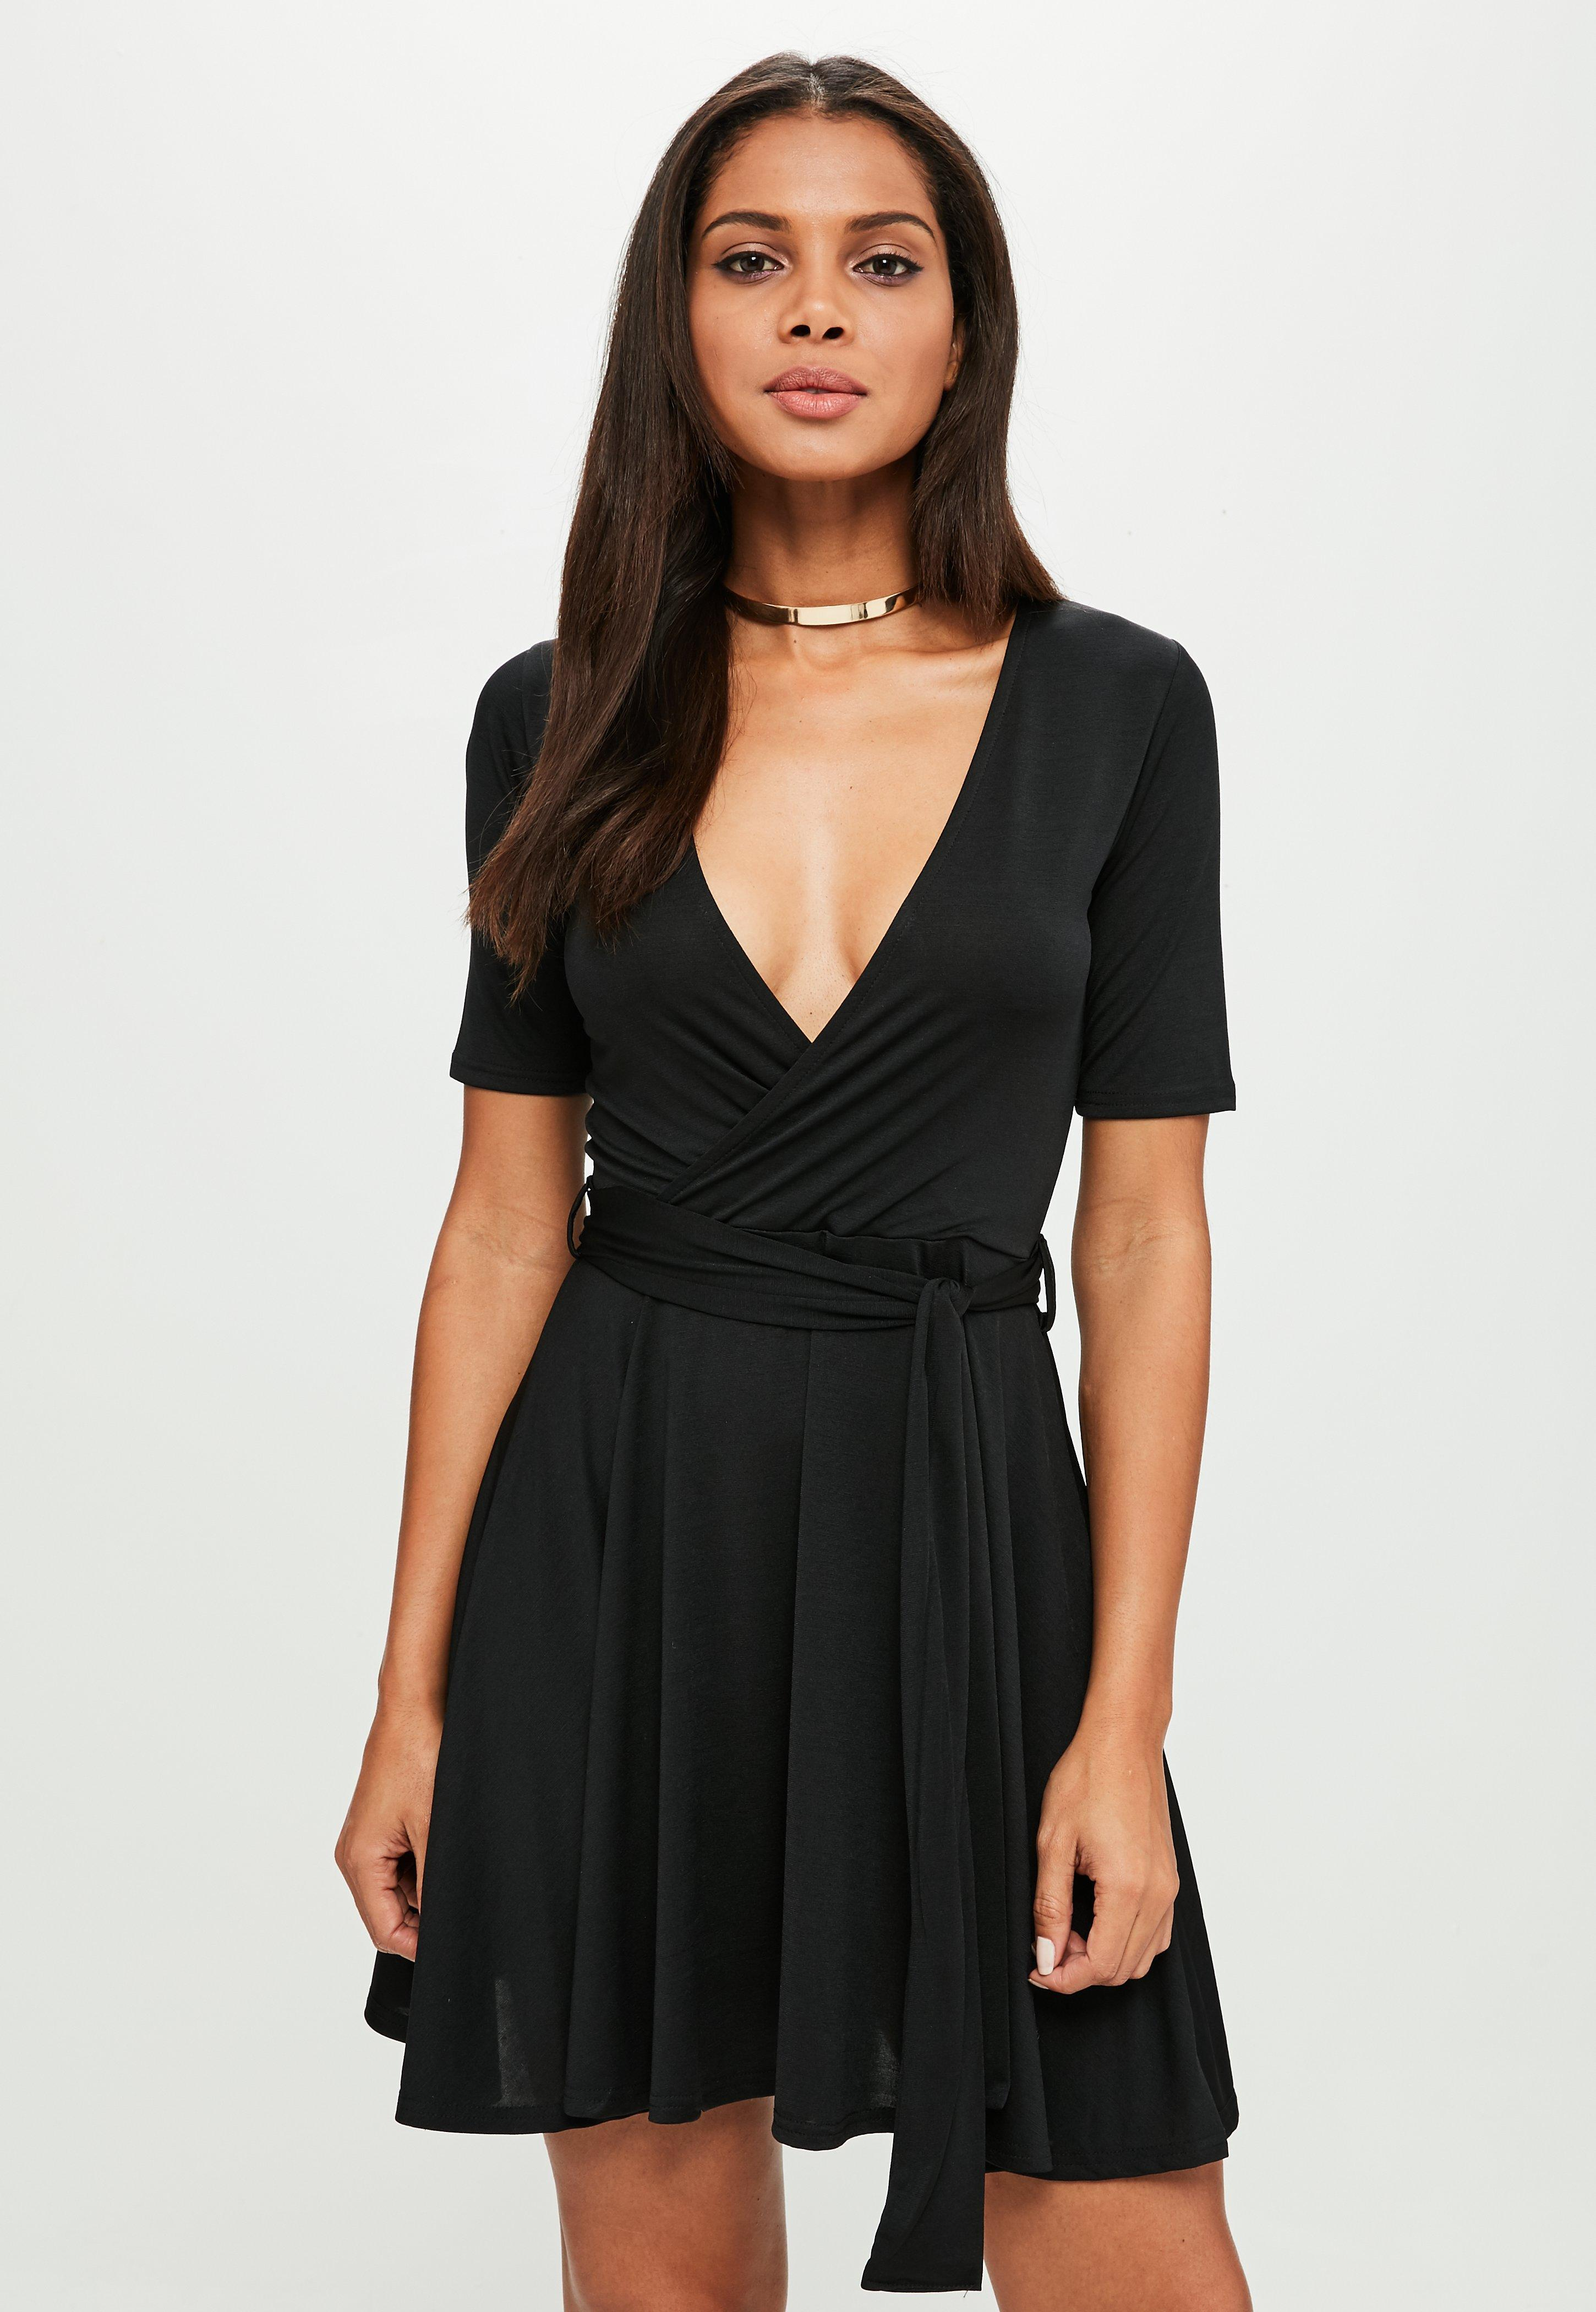 ca6946f8c1 Lyst - Missguided Black Tie Wrap Skater Skirt Dress in Black